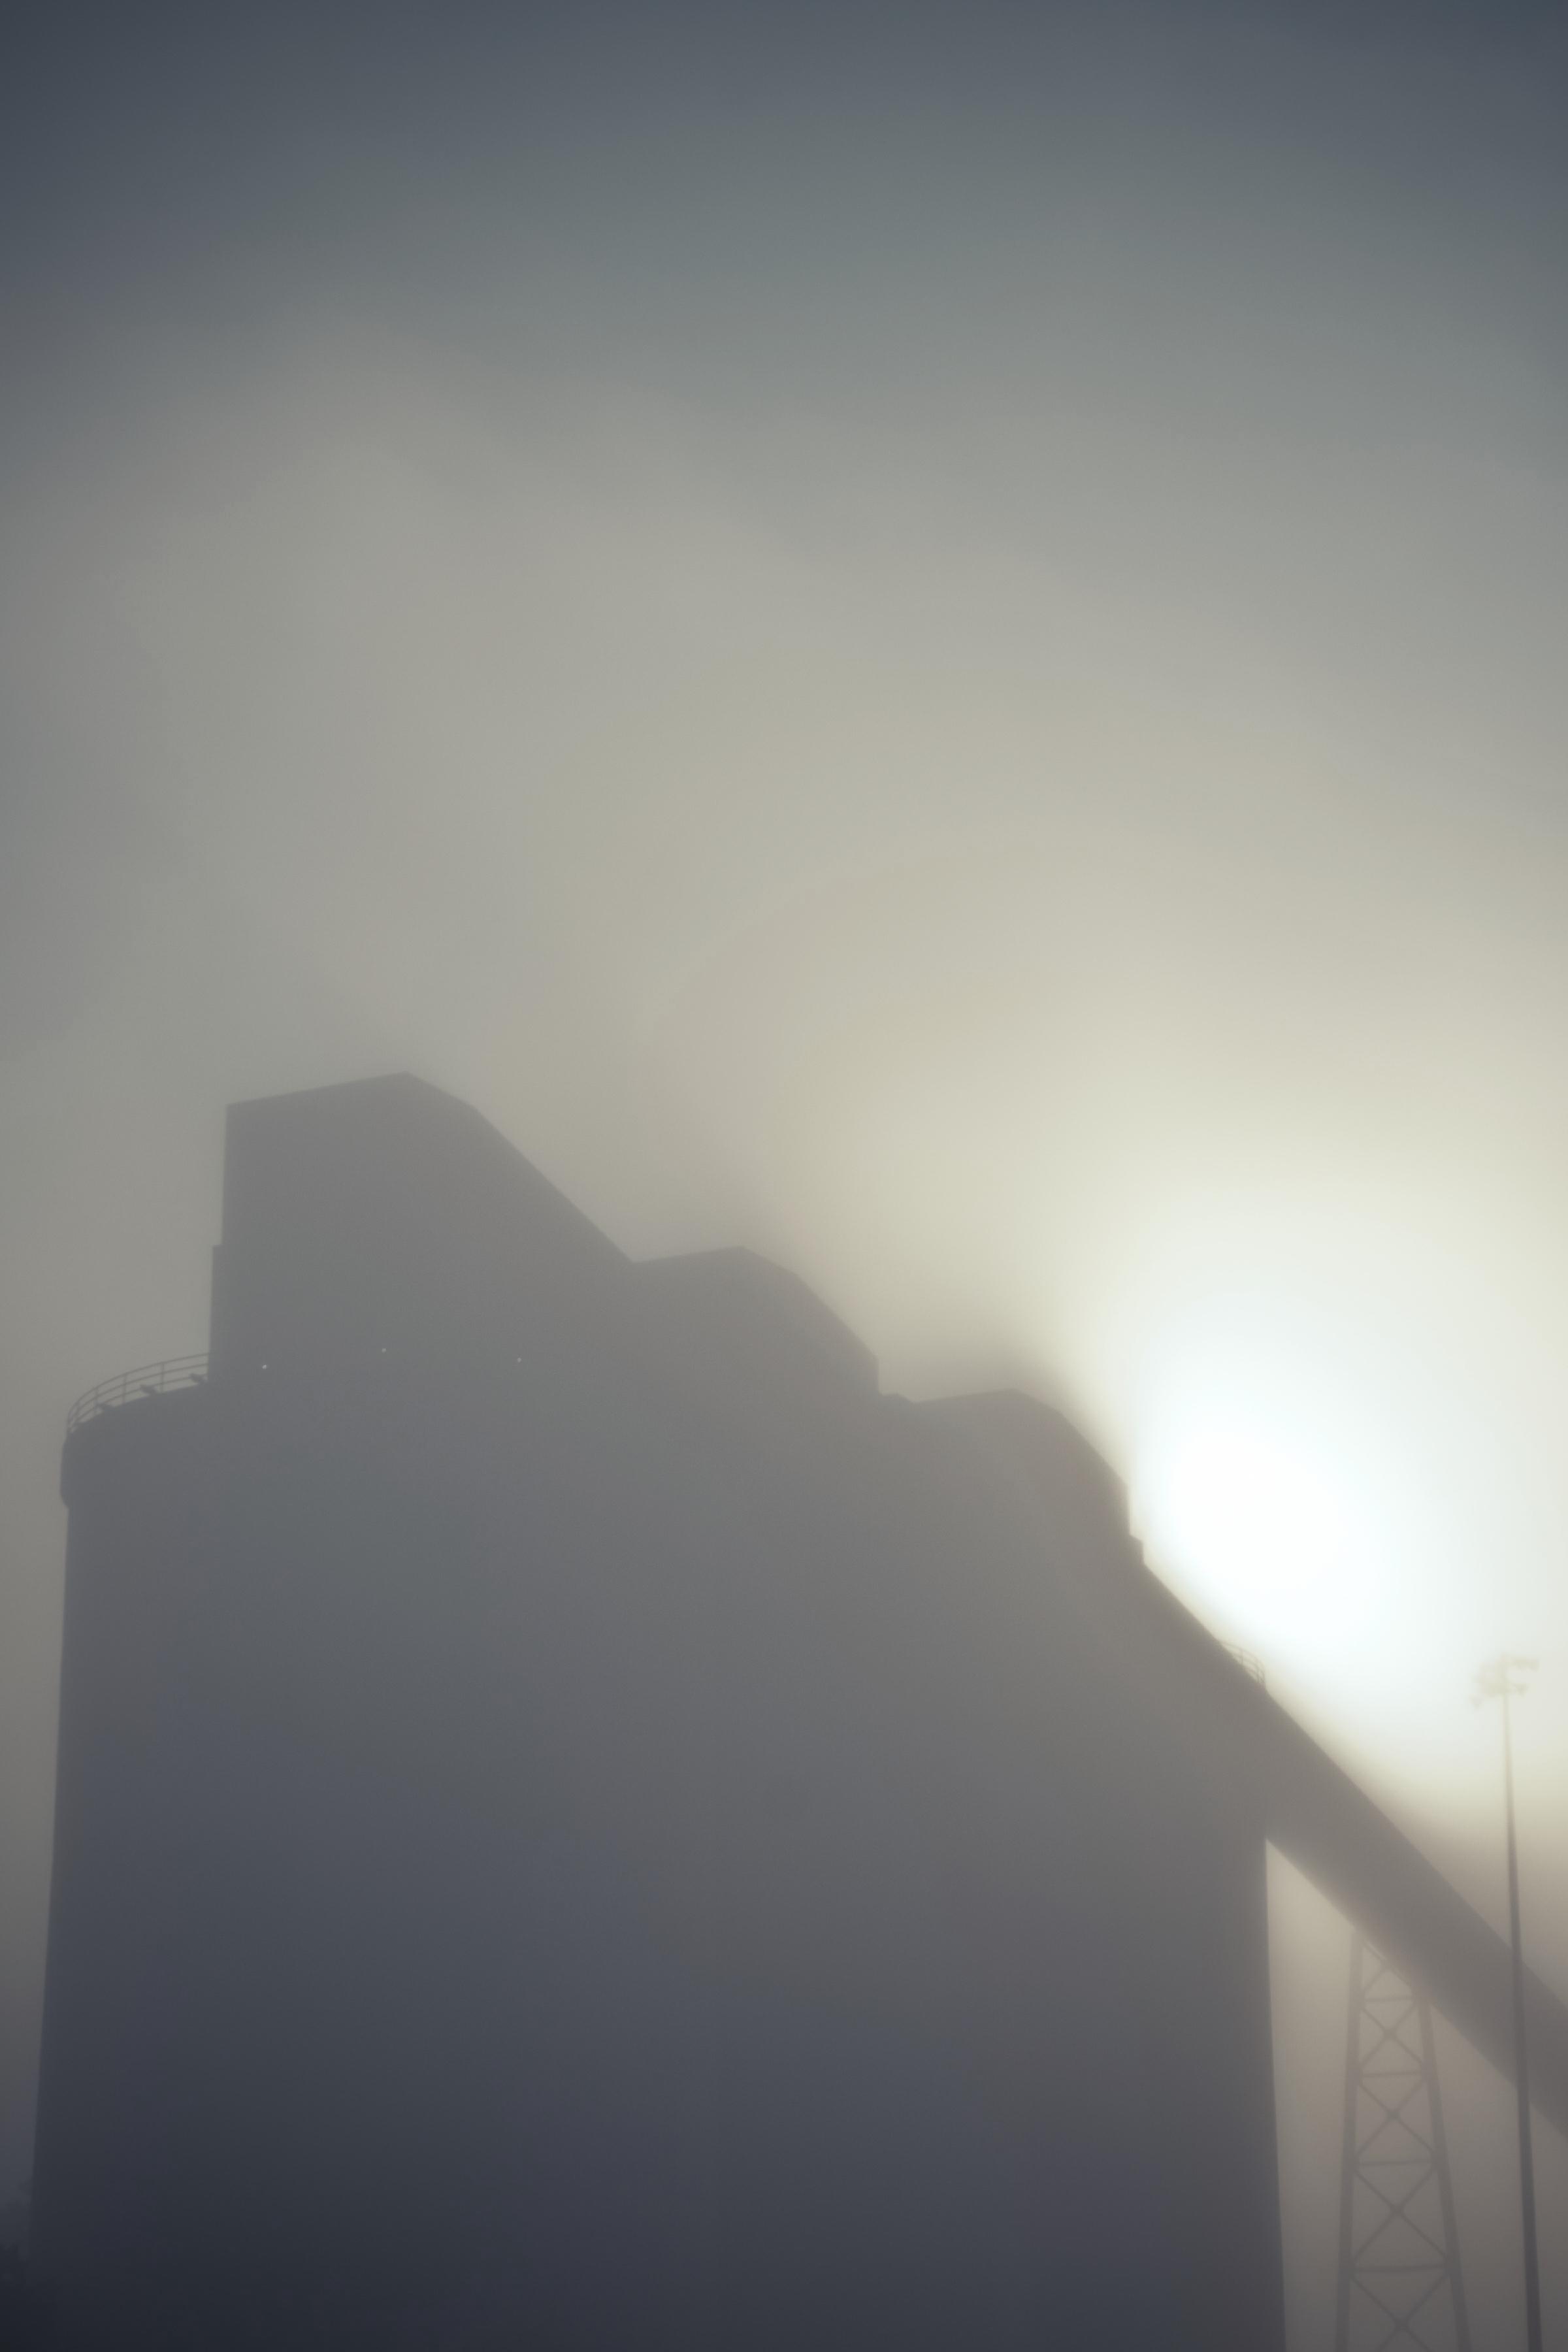 20100427_ucc_cumberland_plant_1_Alien_skin.jpg